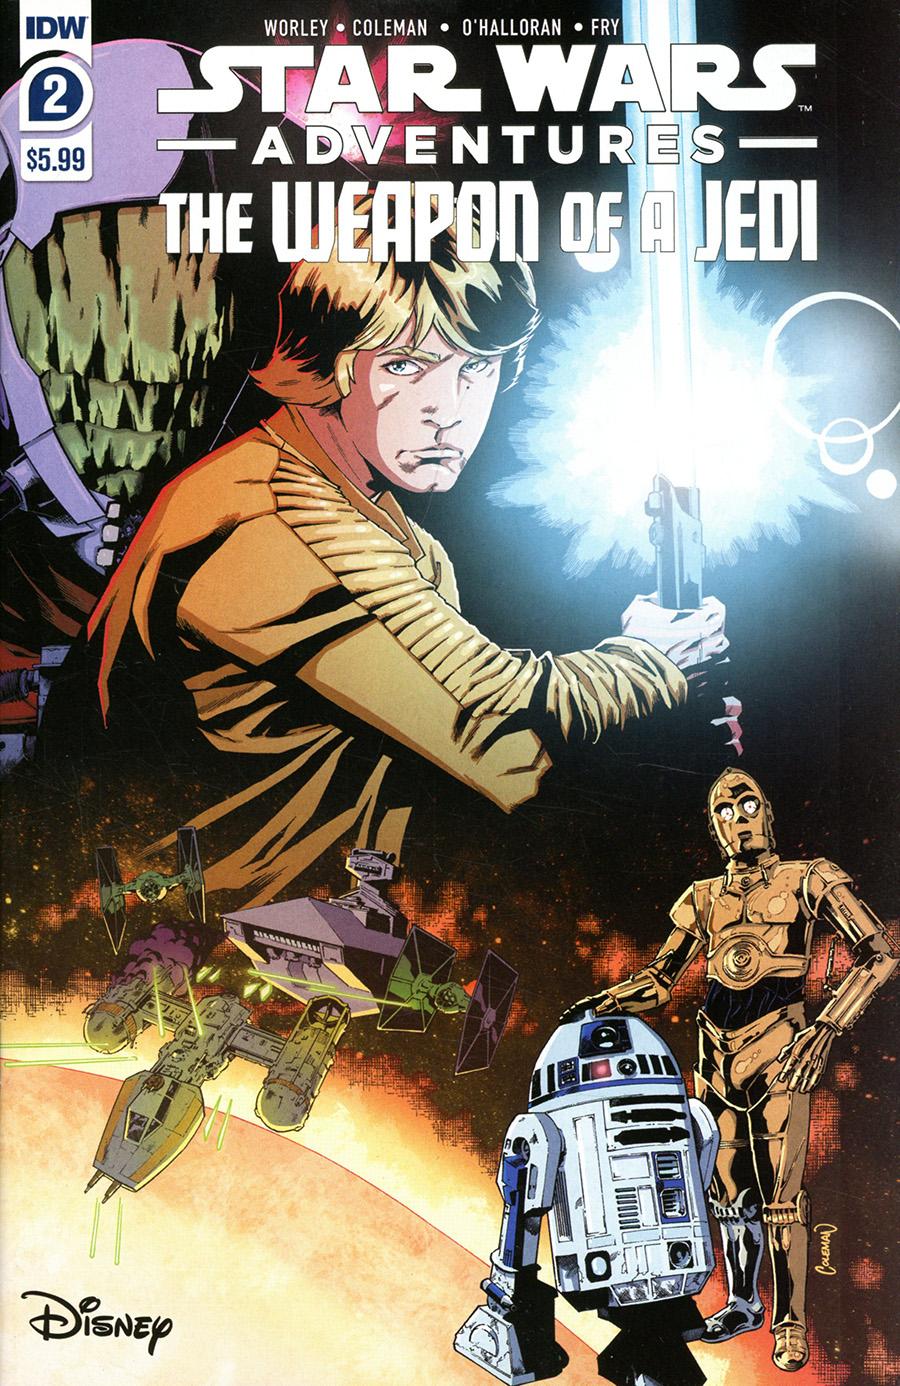 Star Wars Adventures Weapon Of A Jedi #2